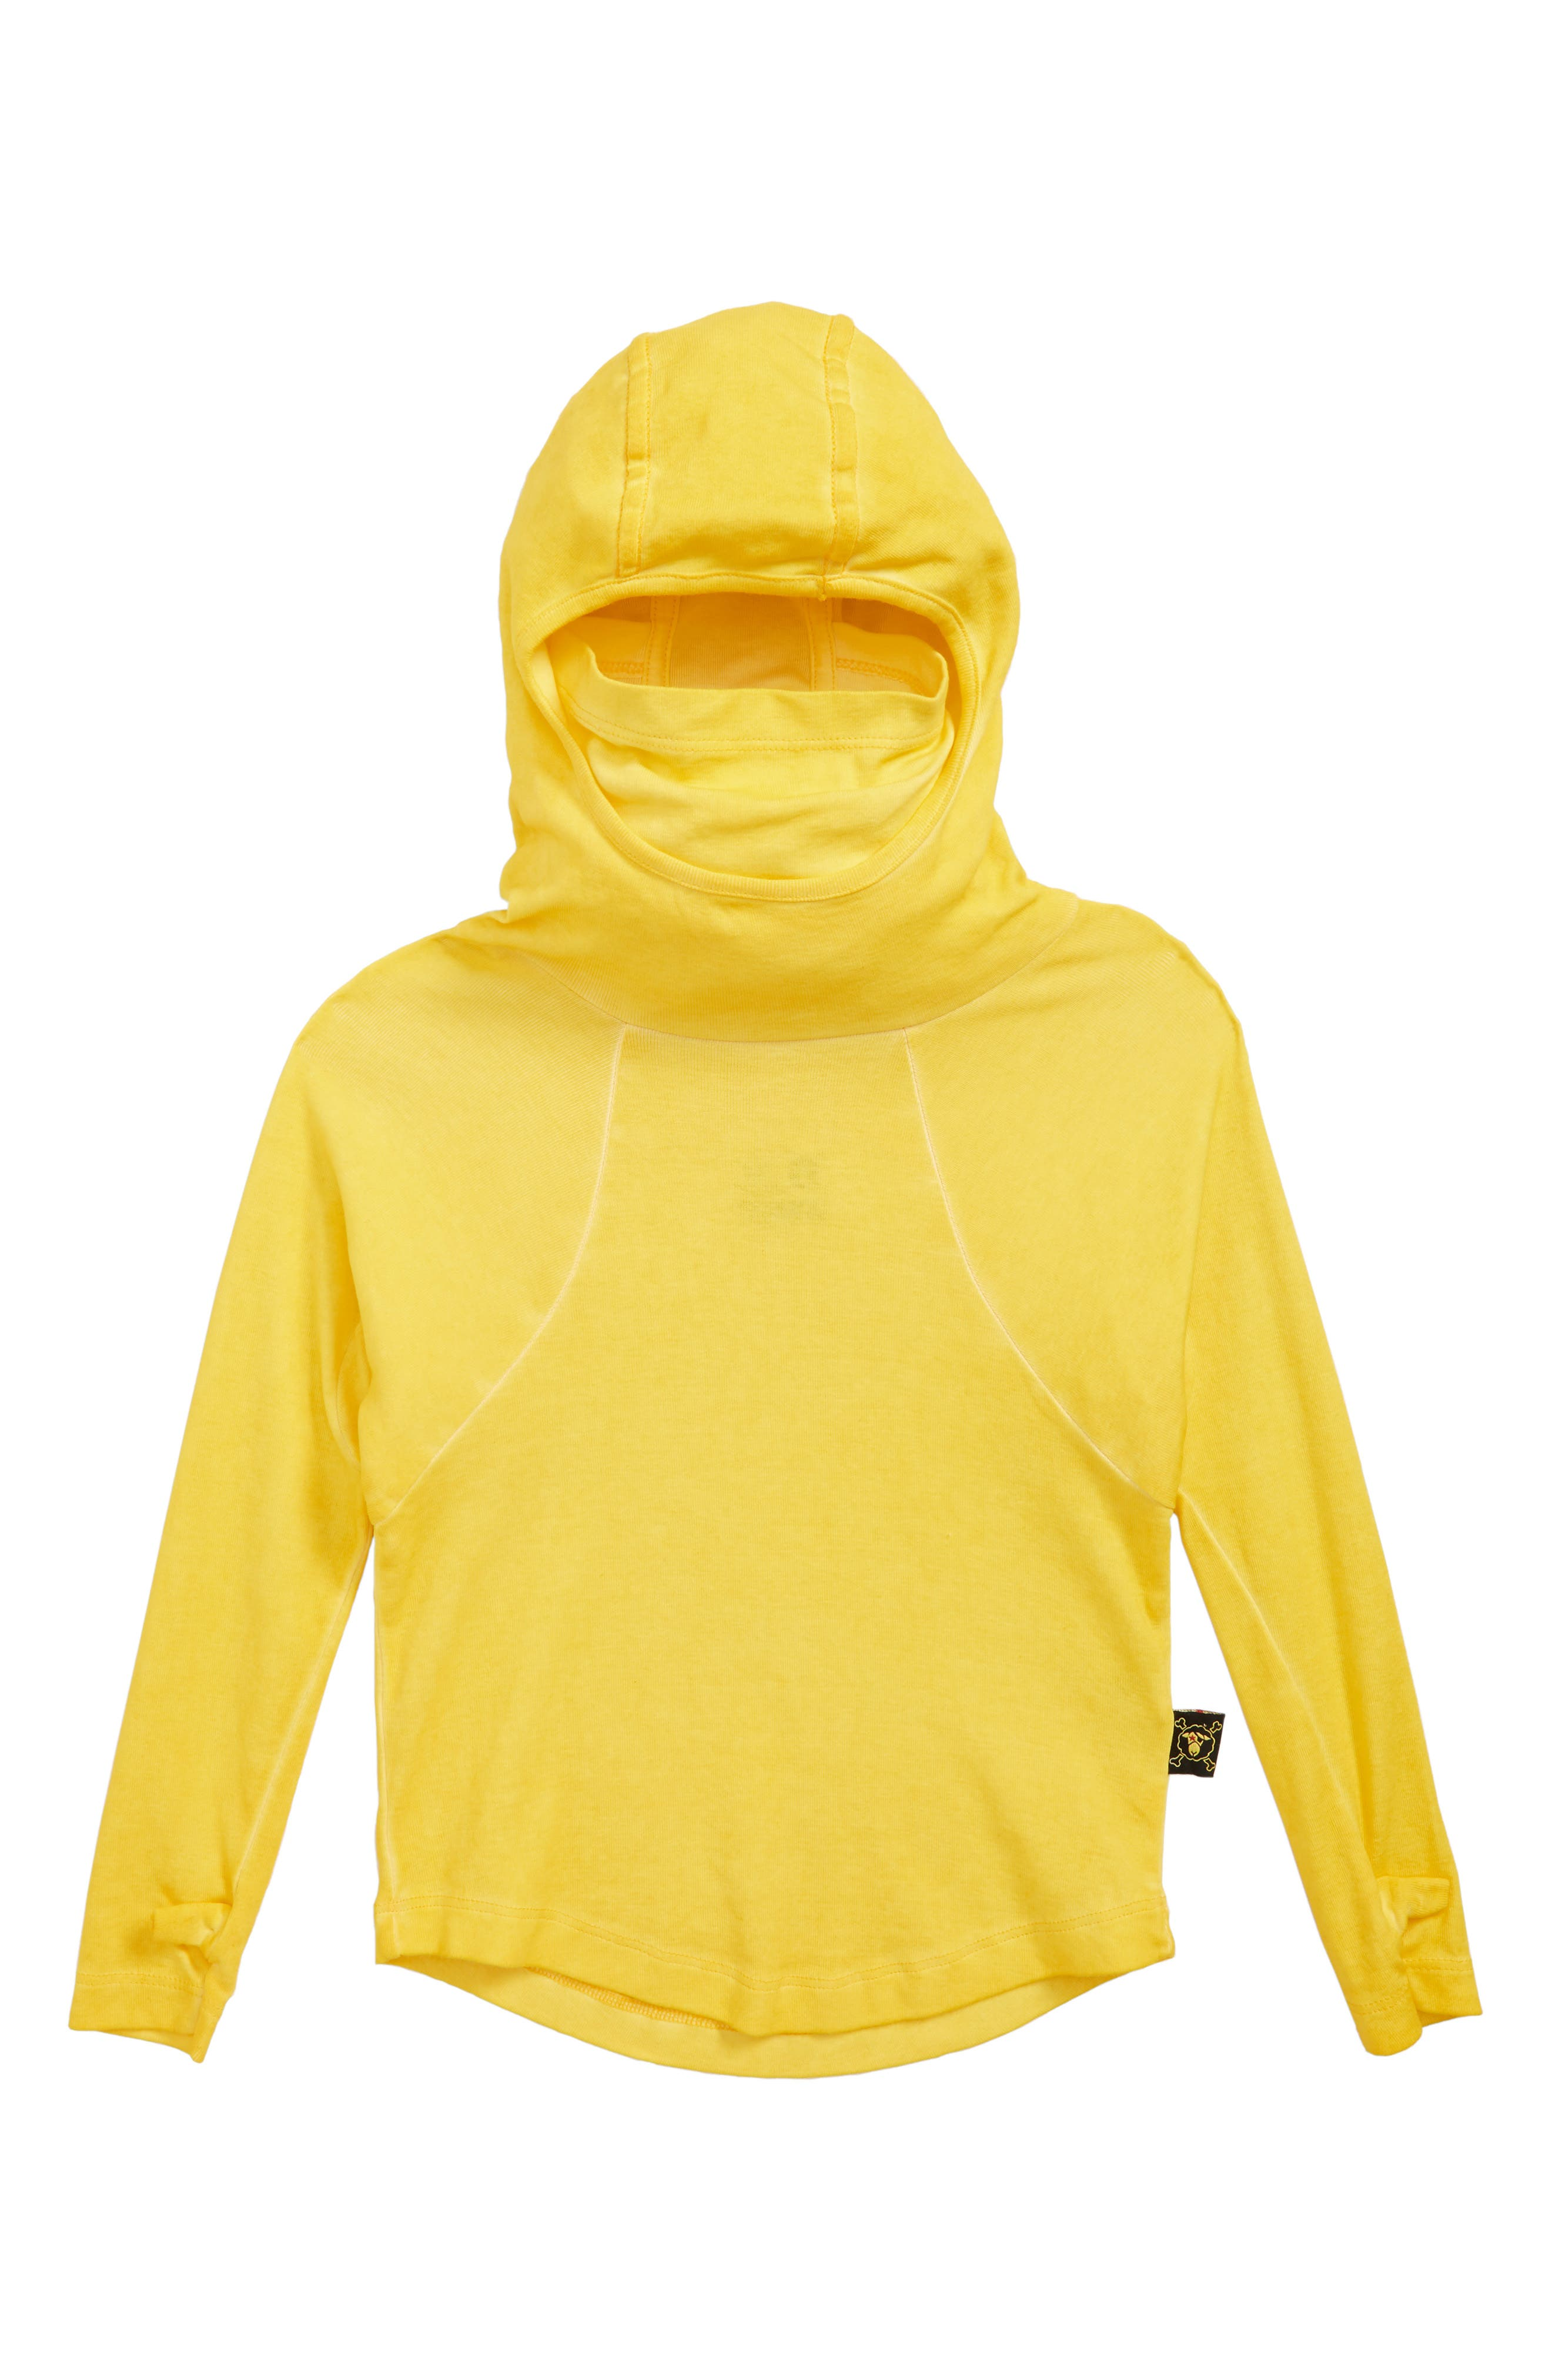 Ninja Hooded Shirt,                             Main thumbnail 1, color,                             DUSTY YELLOW